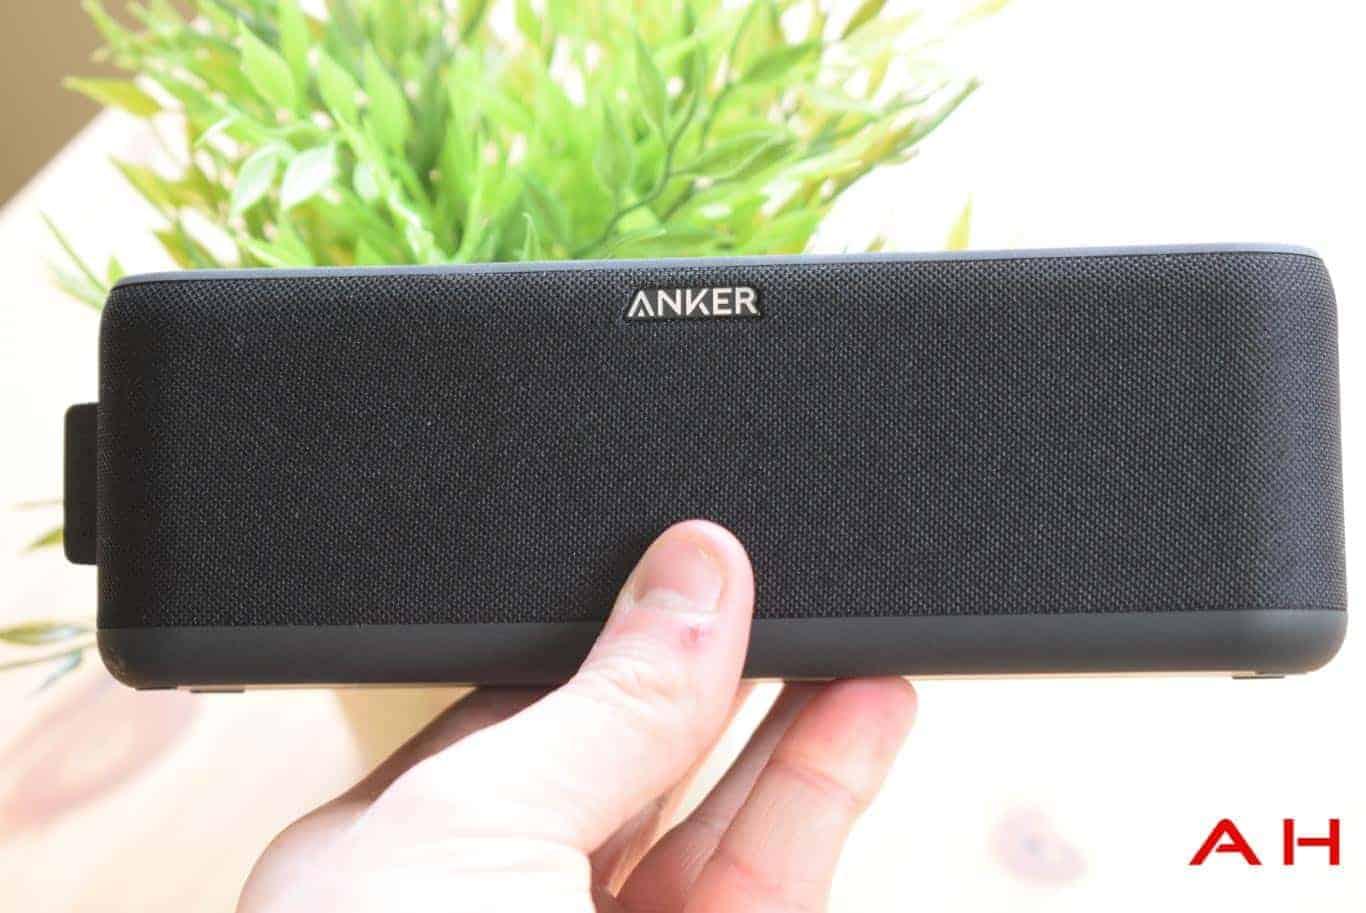 Anker SoundCore Boost AM AH 5